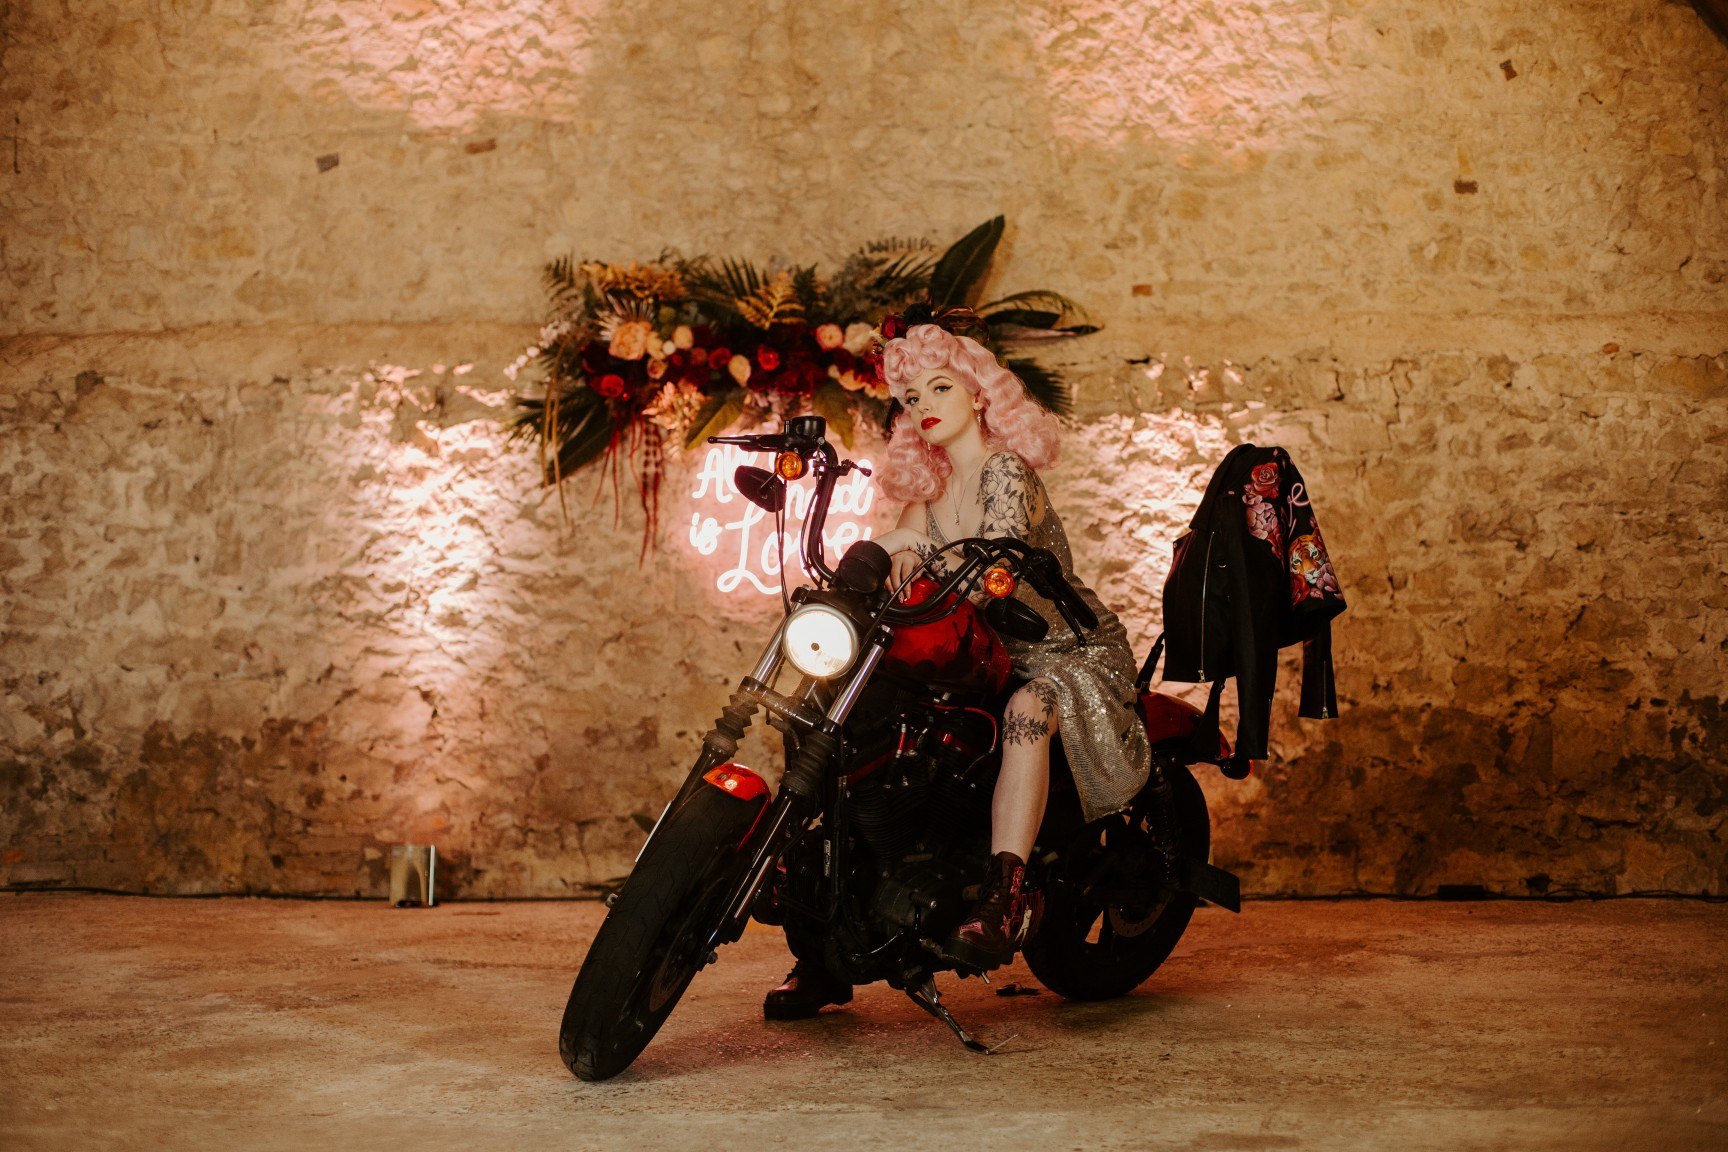 rock and roll wedding - edgy wedding inspiration - bride on motorbike - biker bride - harley davidson wedding - edgy bridal wear